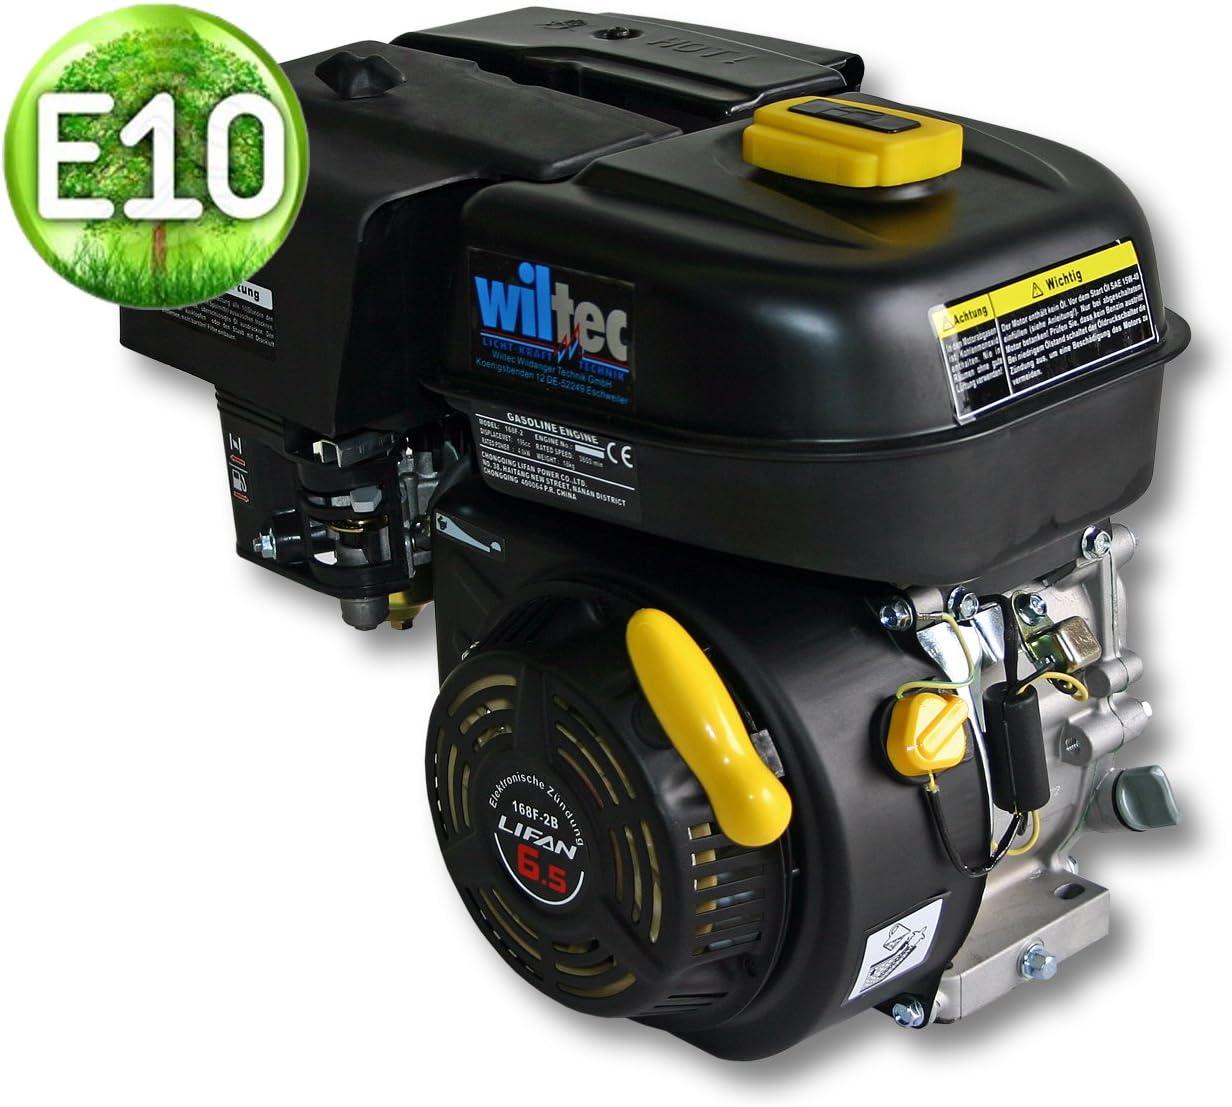 WilTec Motor de Gasolina LIFAN 168 4,8kW (6,5PS) Motor para Karts de 20mm